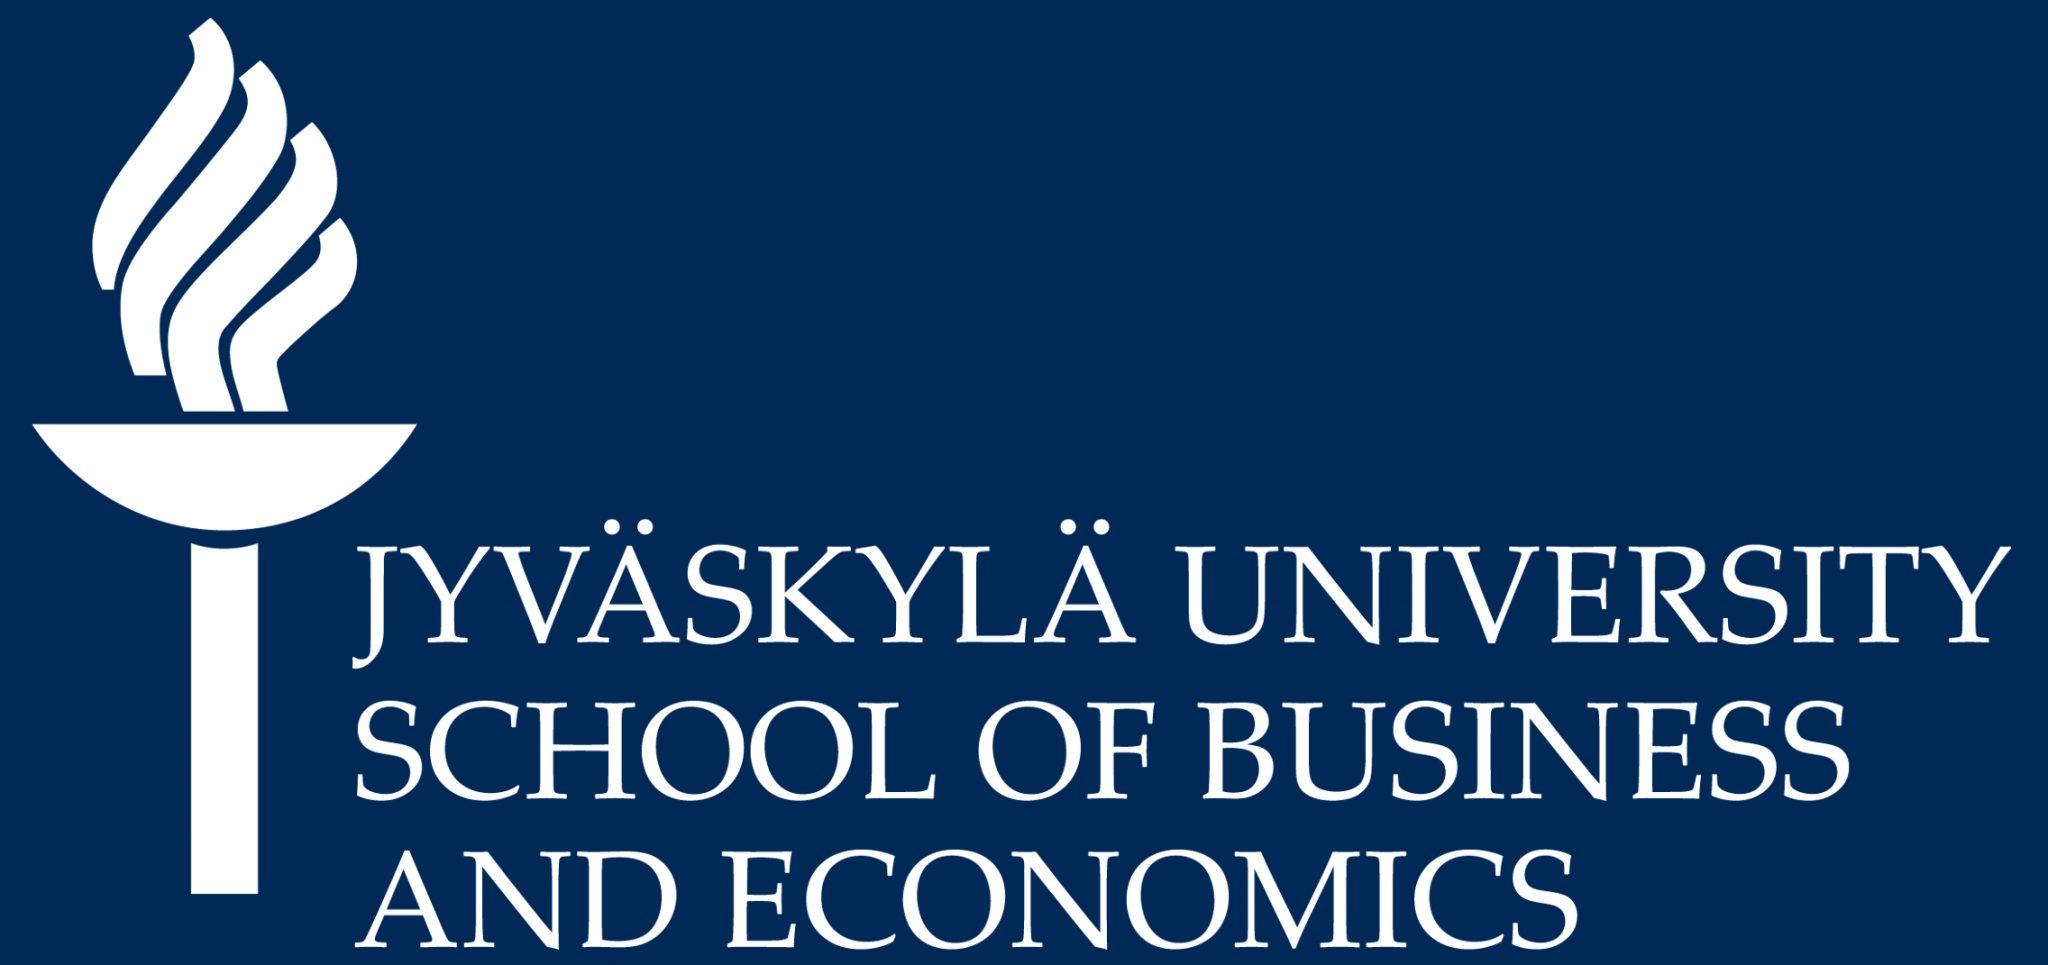 Jyväskylä University School of Business and Economics